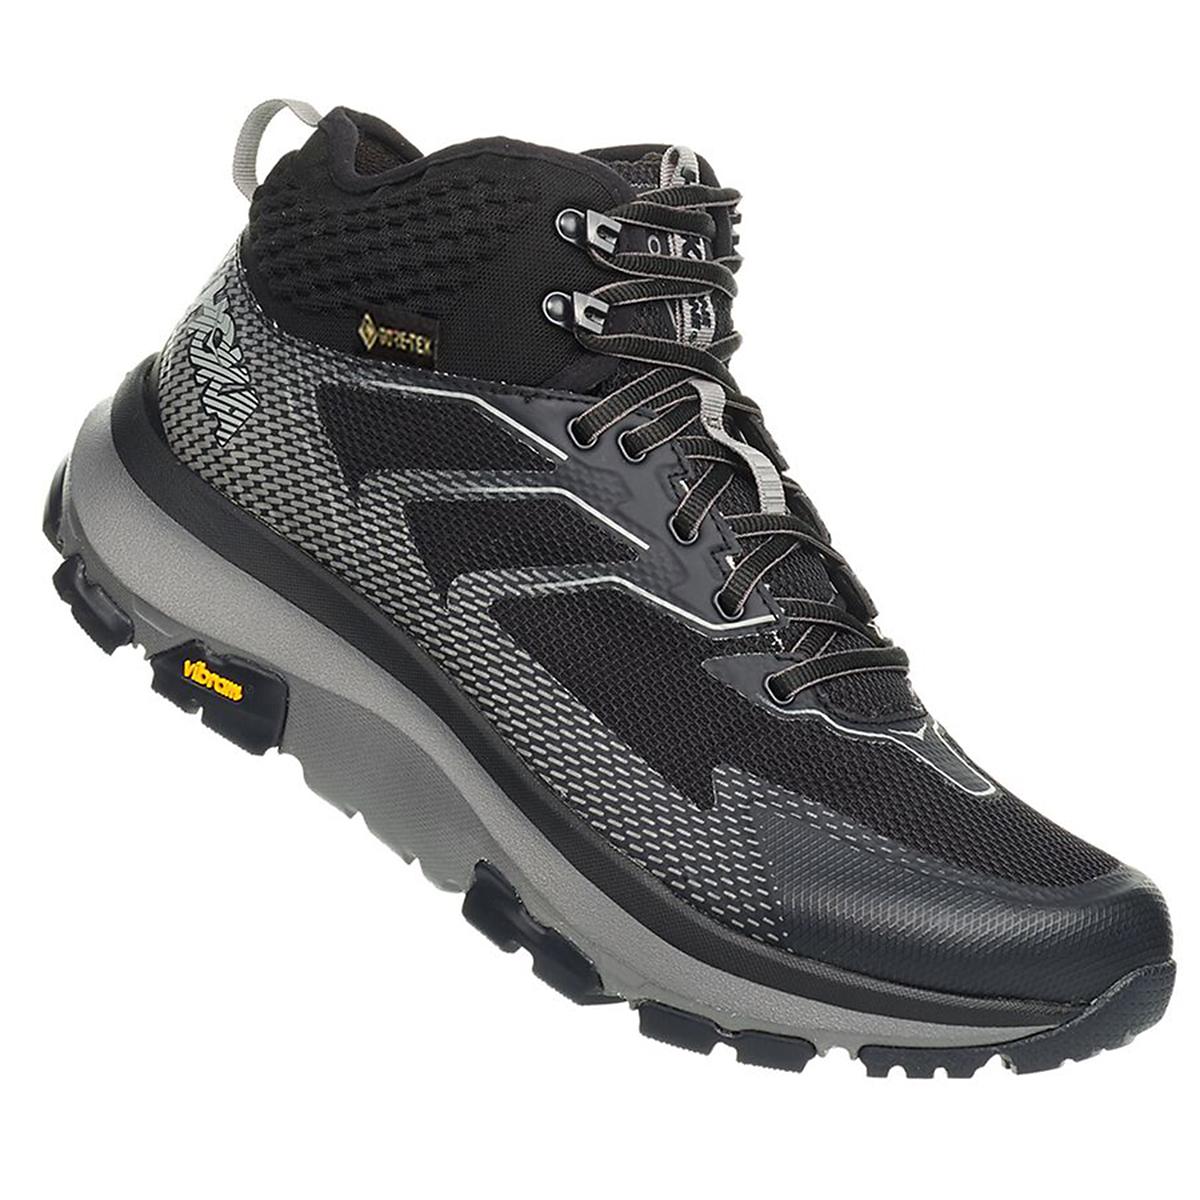 Men's Hoka One One Sky Toa Gore-Tex Trail Running Shoe - Color: Phantom - Size: 7 - Width: Regular, Phantom, large, image 5